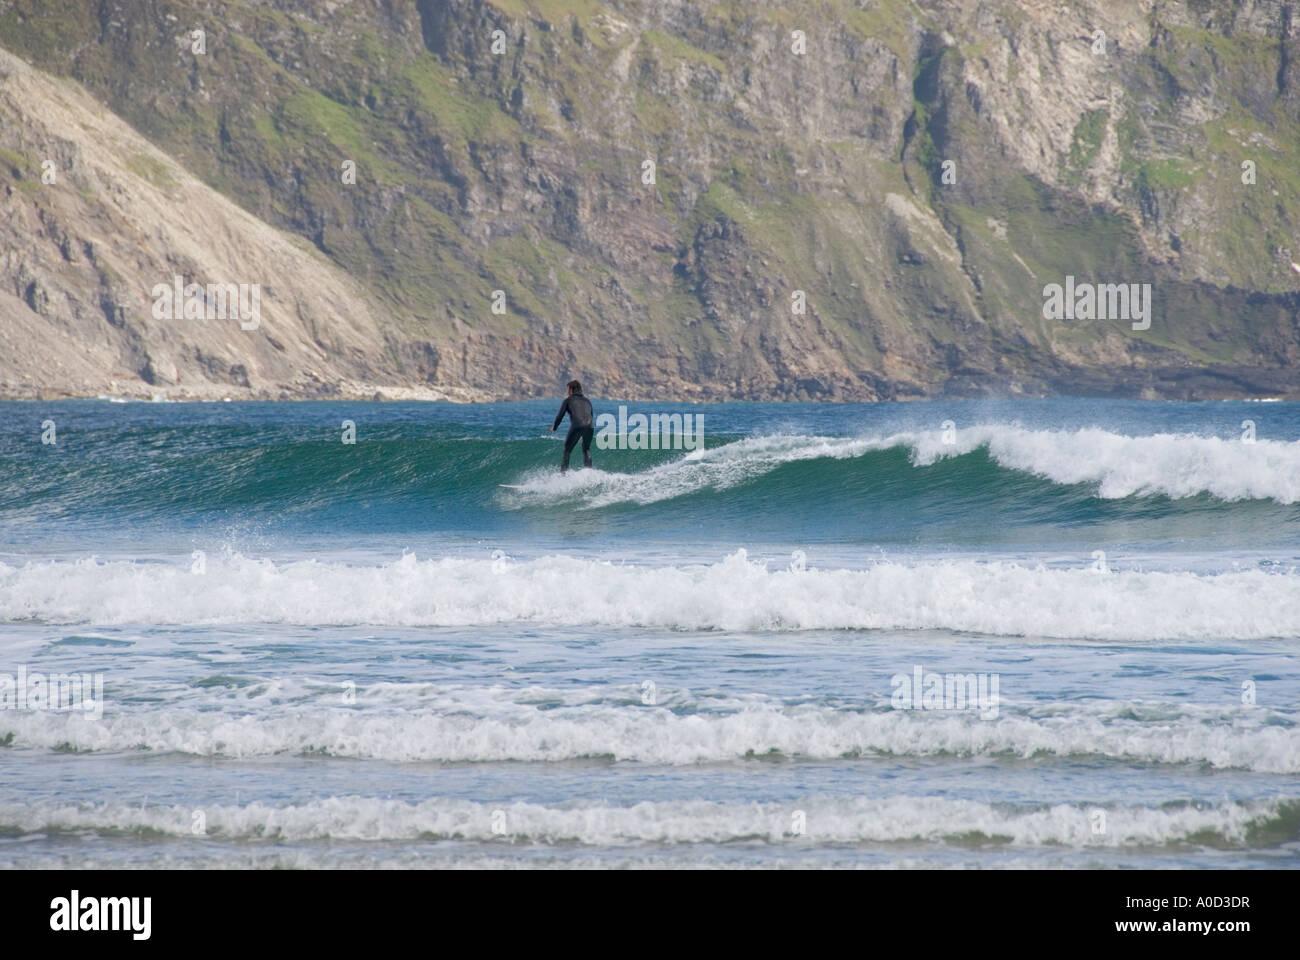 Ireland County Mayo Achill Island Keel Beach surfer - Stock Image